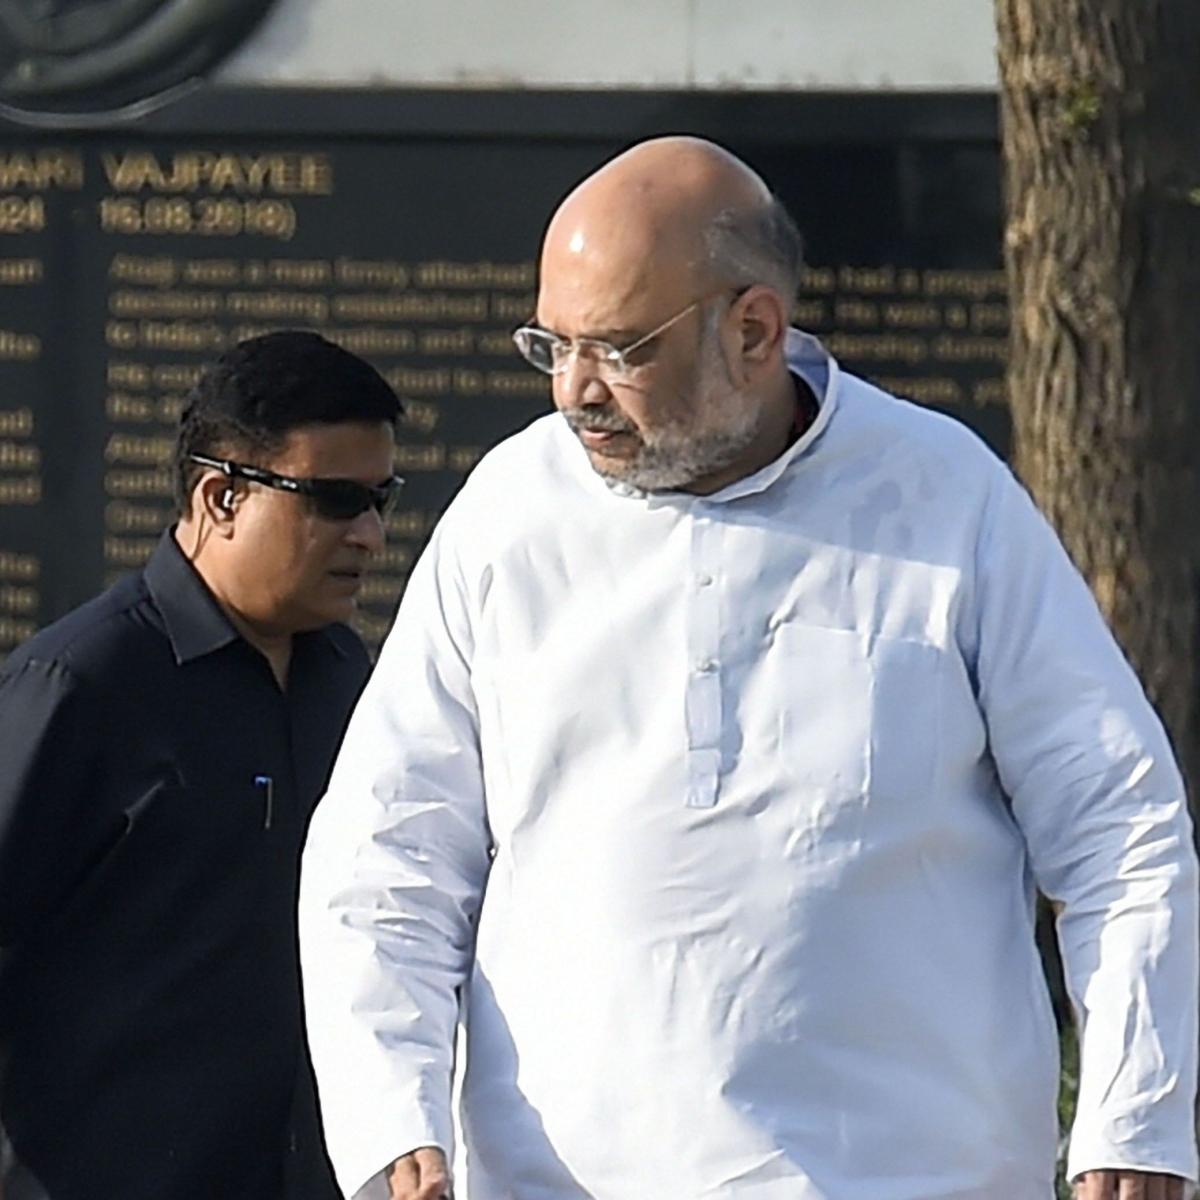 'Will keep working towards Tamil Nadu's welfare': PM Modi, Amit Shah after DMK's MK Stalin wrests power from AIADMK